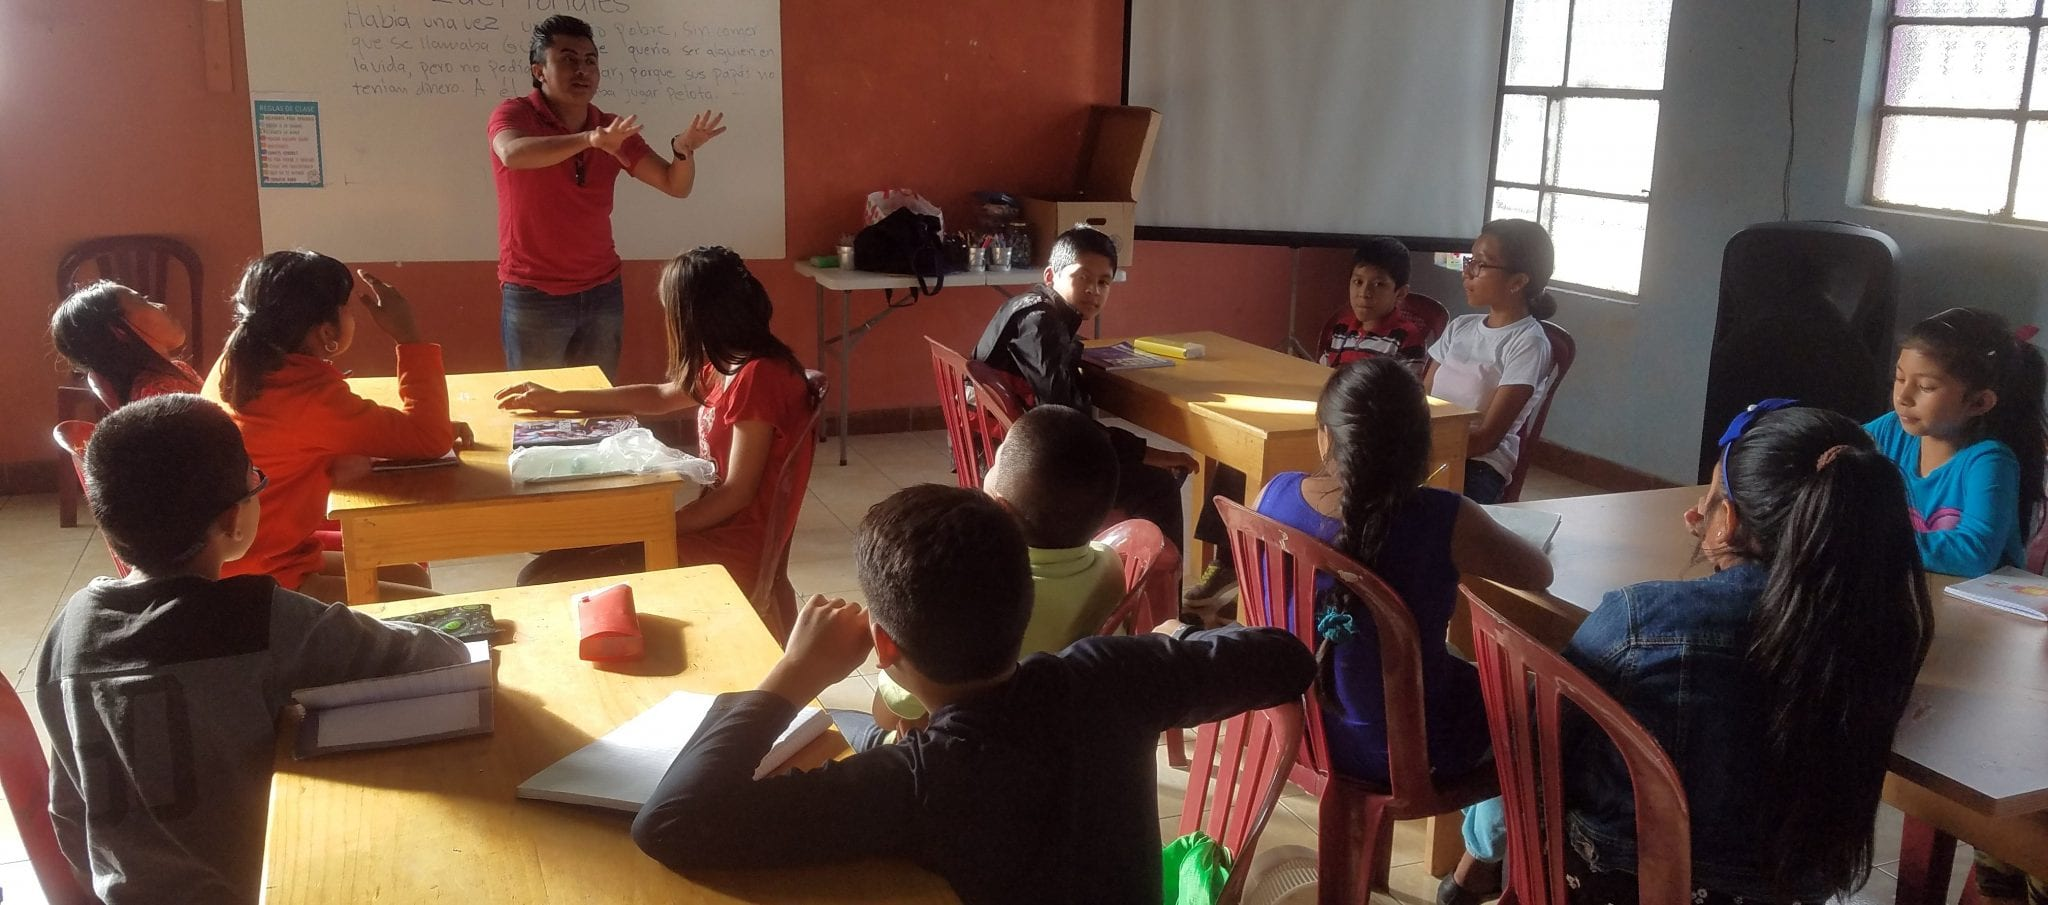 Eduardo teaching math class at our community center in colonia santa fe